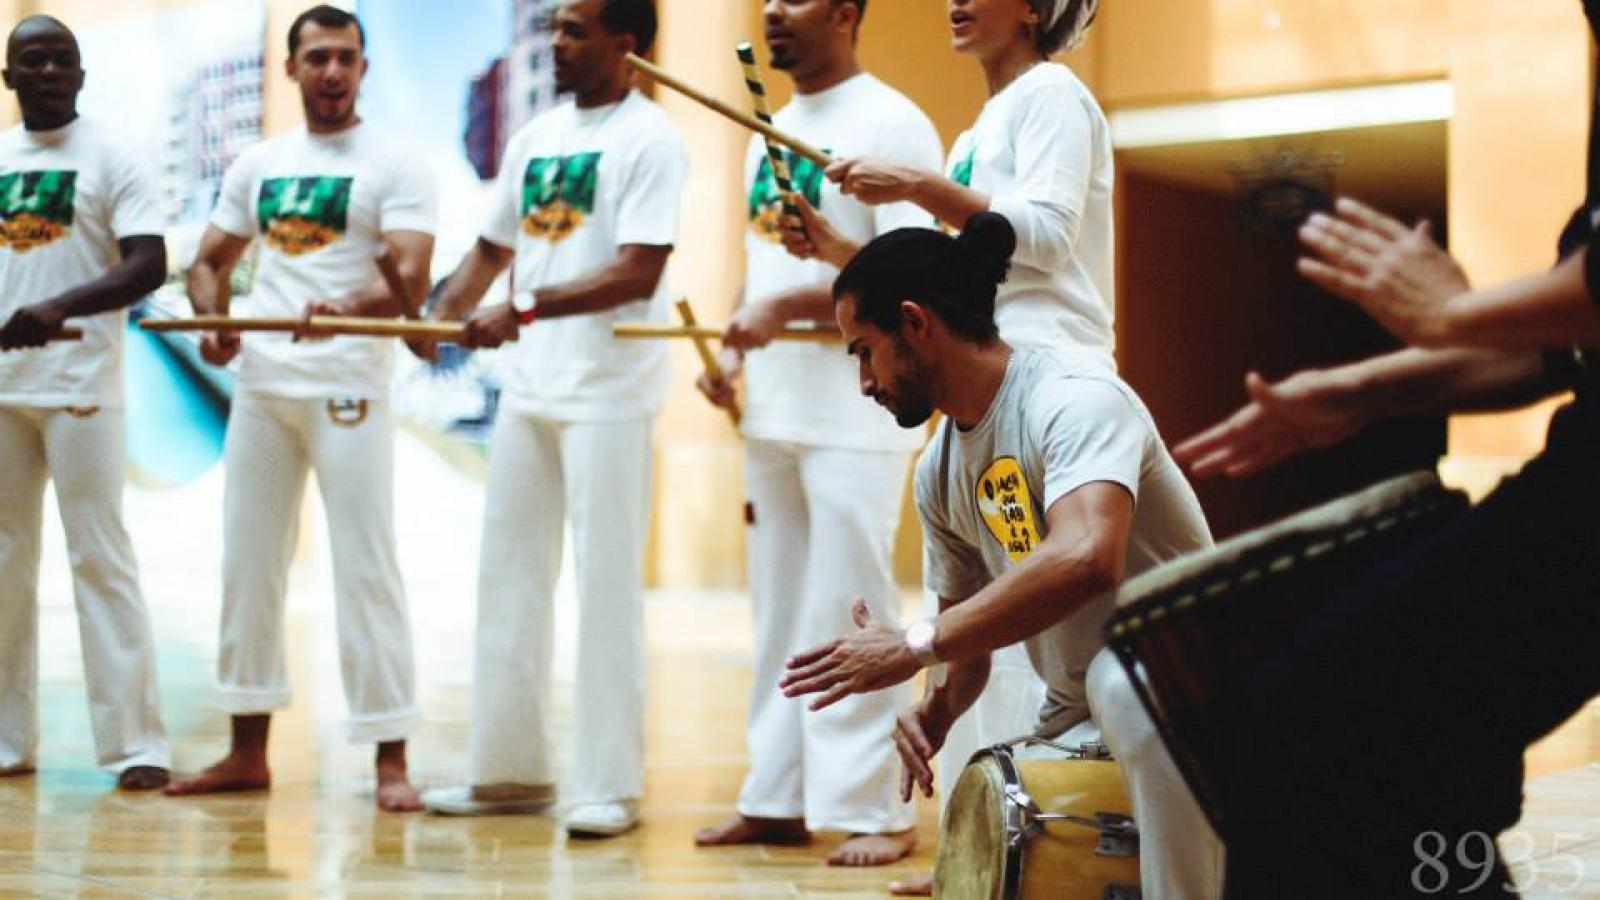 Brazilian marital art in Qatar - Capoeira